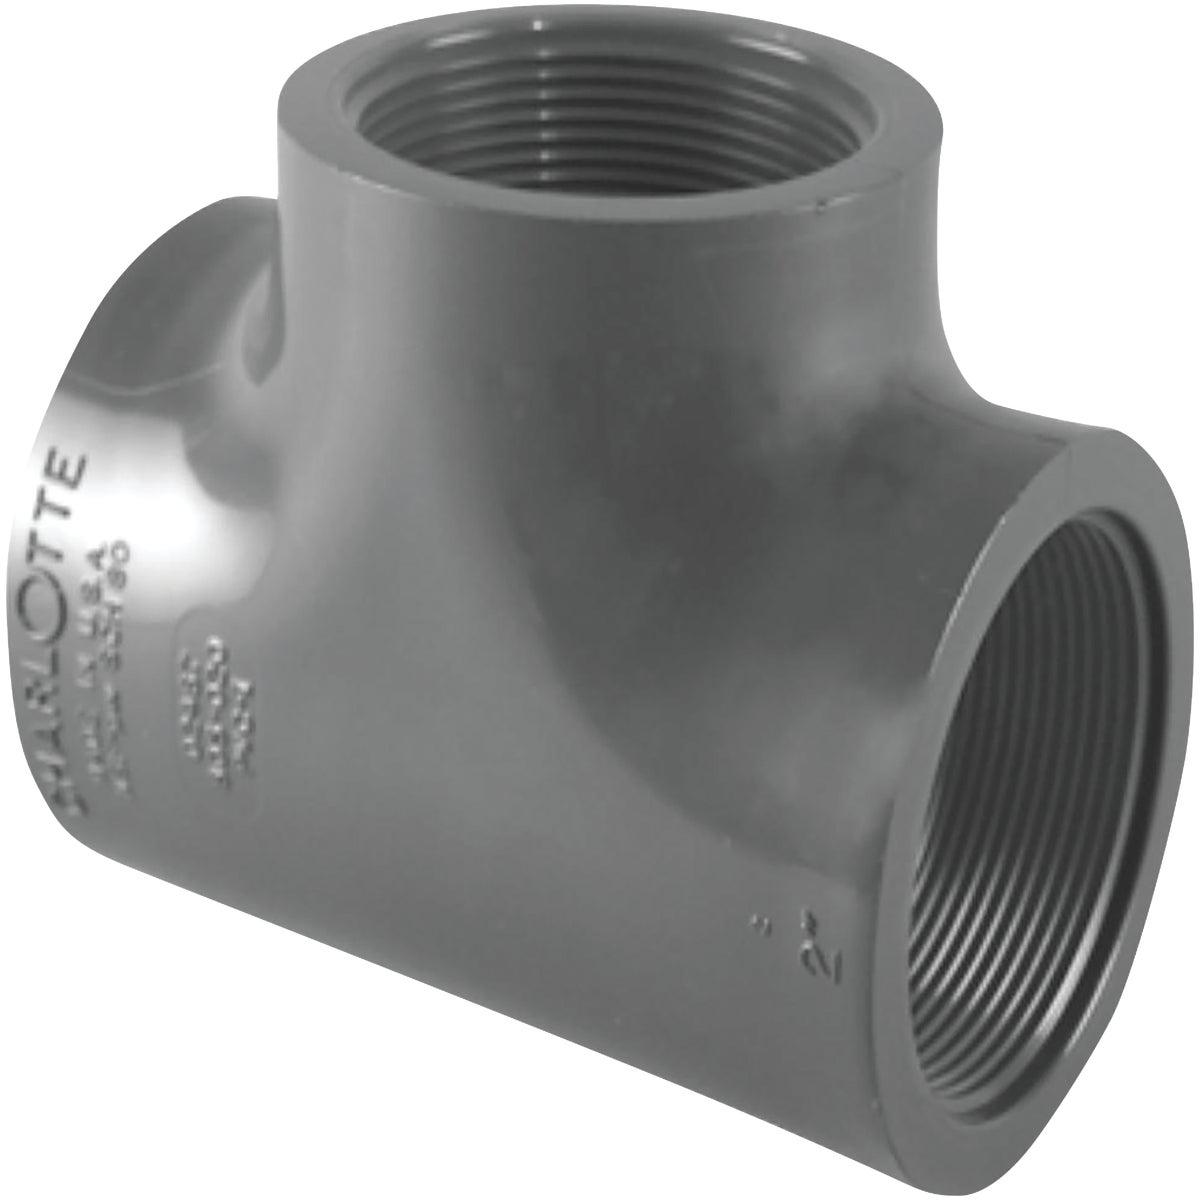 "3/4"" SCH80 PVC FXFXF TEE - 354578 by Genova Inc"